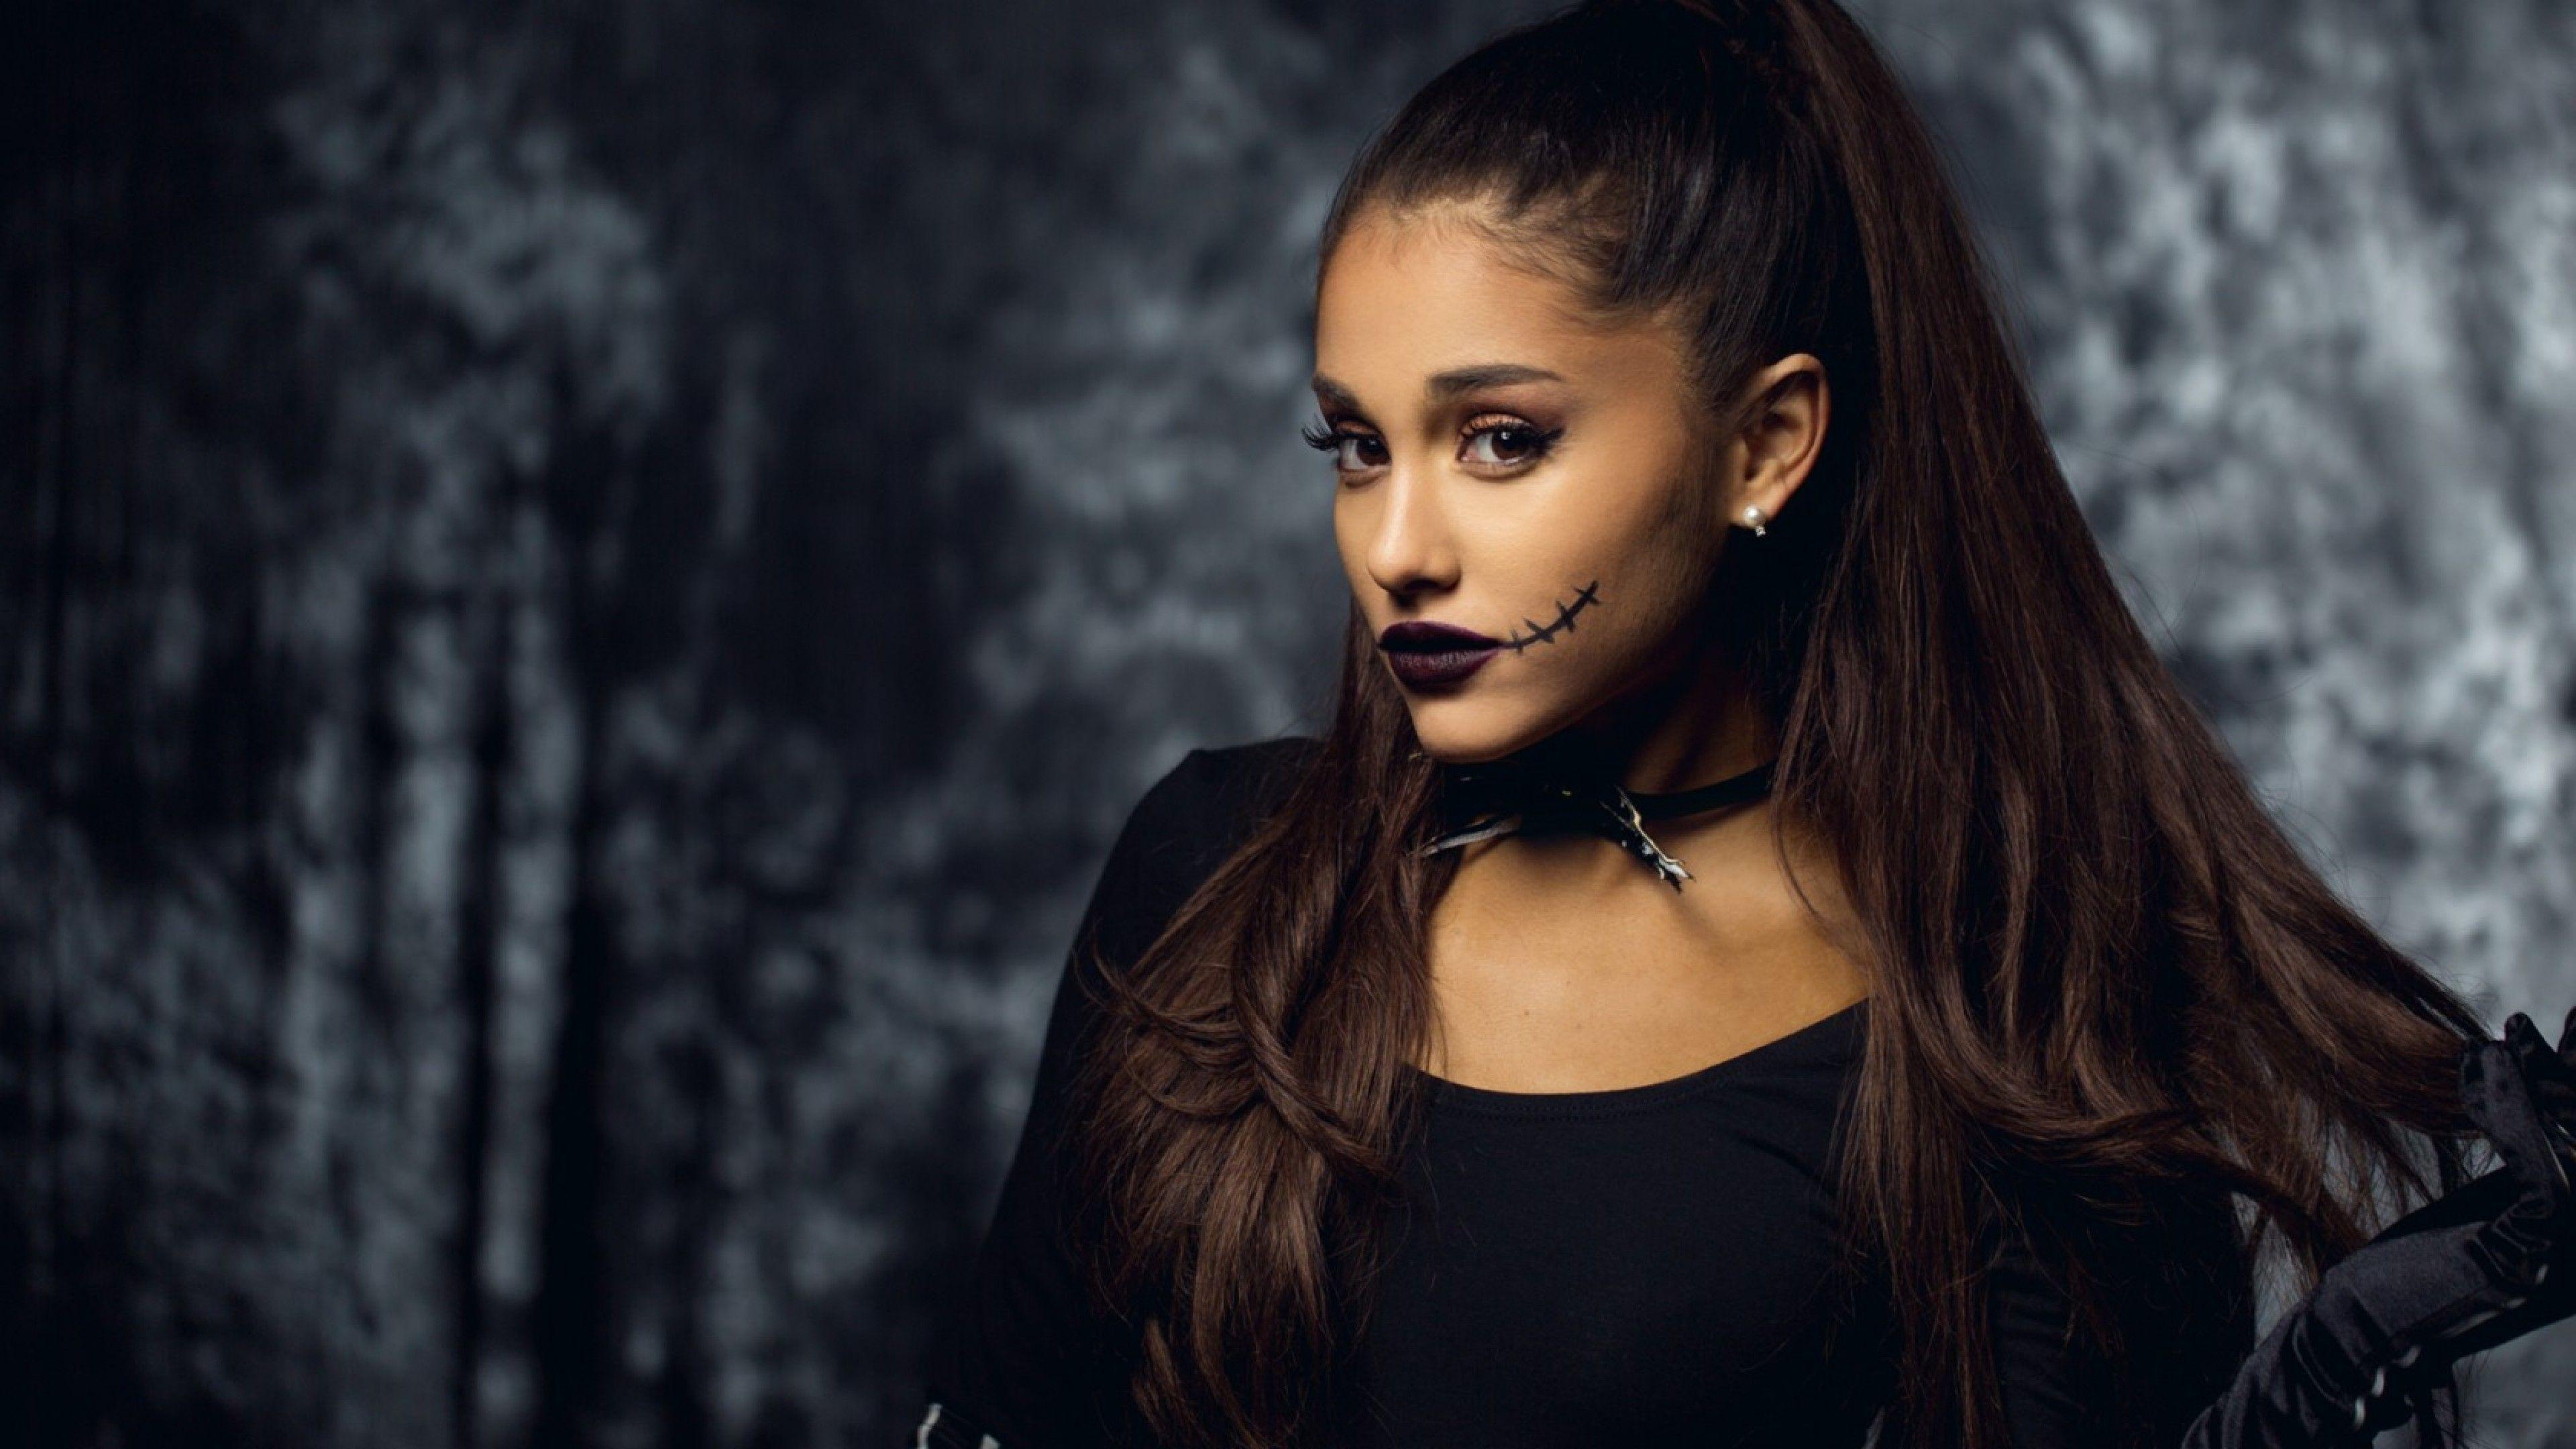 Fondos de pantalla Ariana grande en disfraz